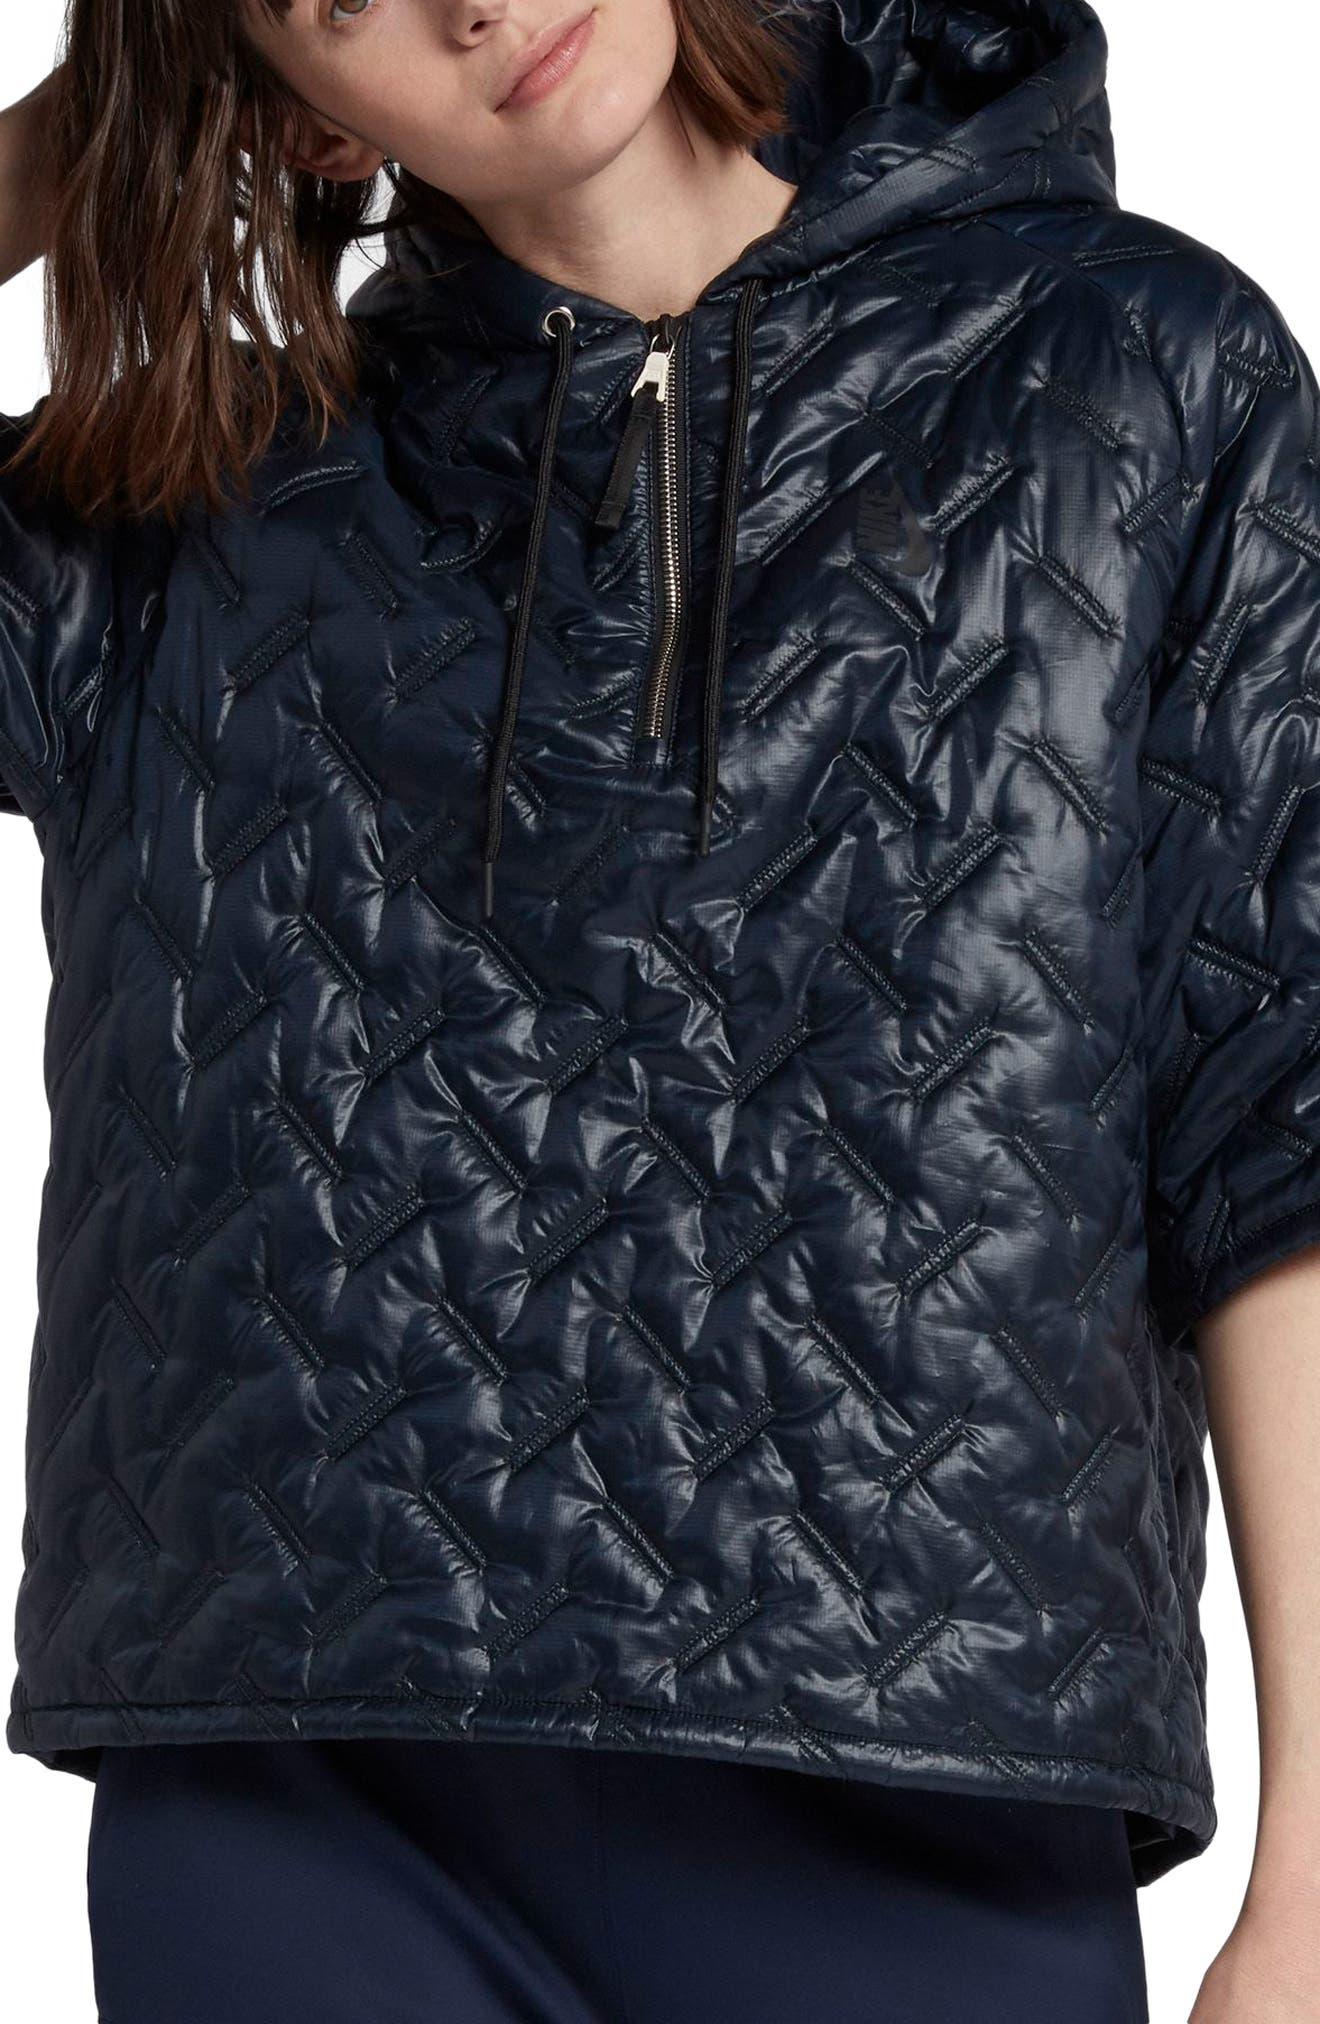 NikeLab Essentials Insulated Short Sleeve Women's Hoodie,                         Main,                         color, Dark Obsidian/ Black